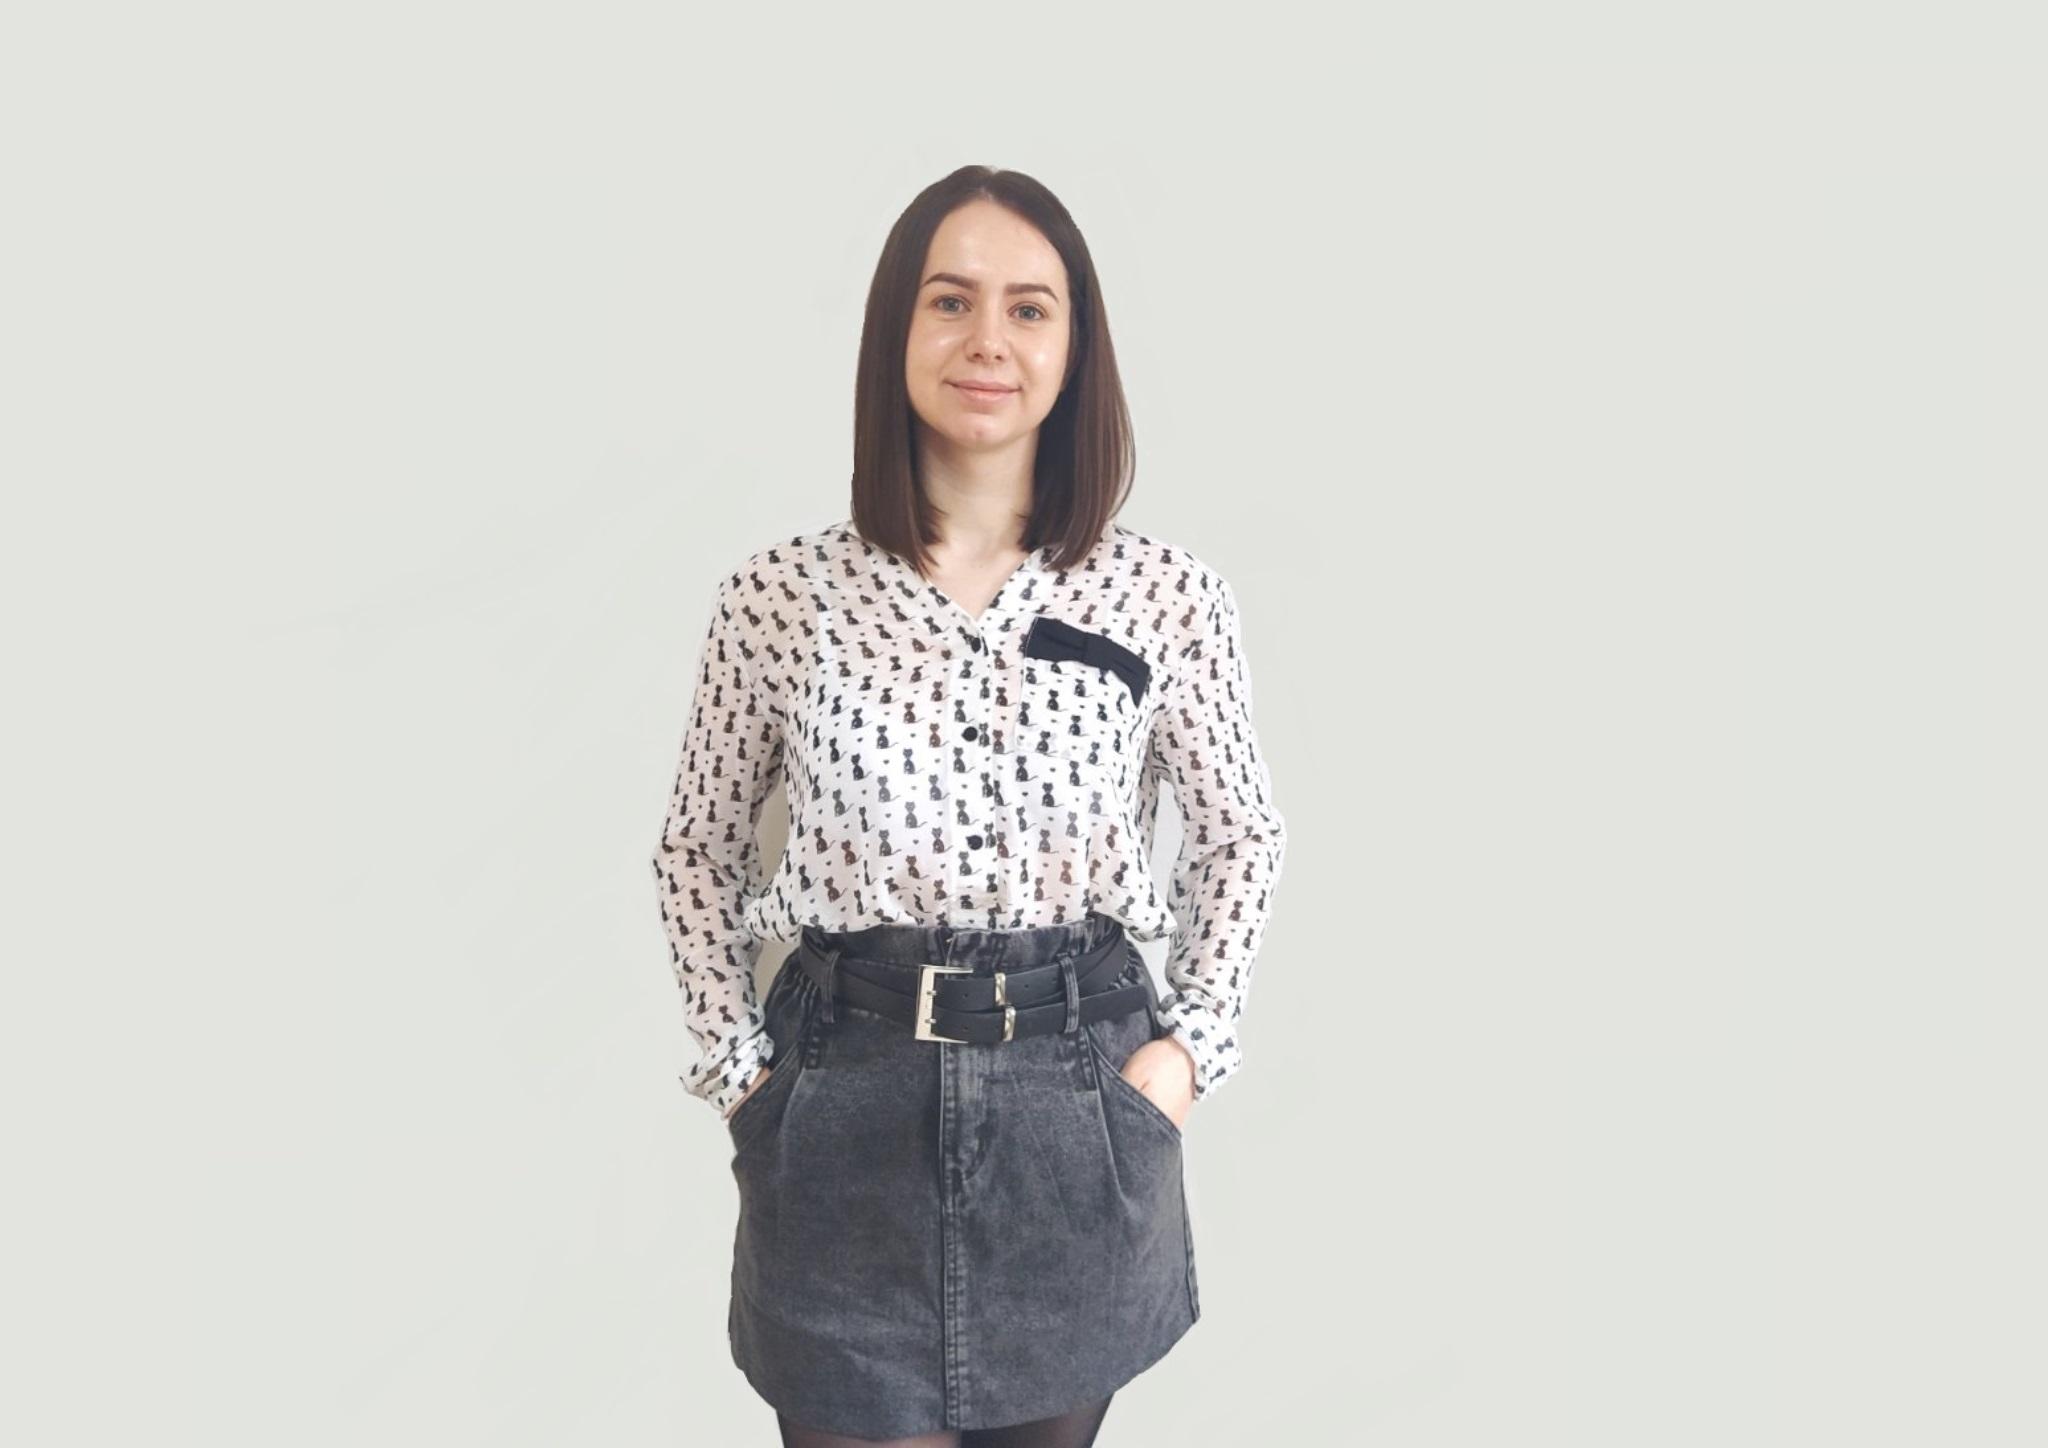 Elena Cebotaru